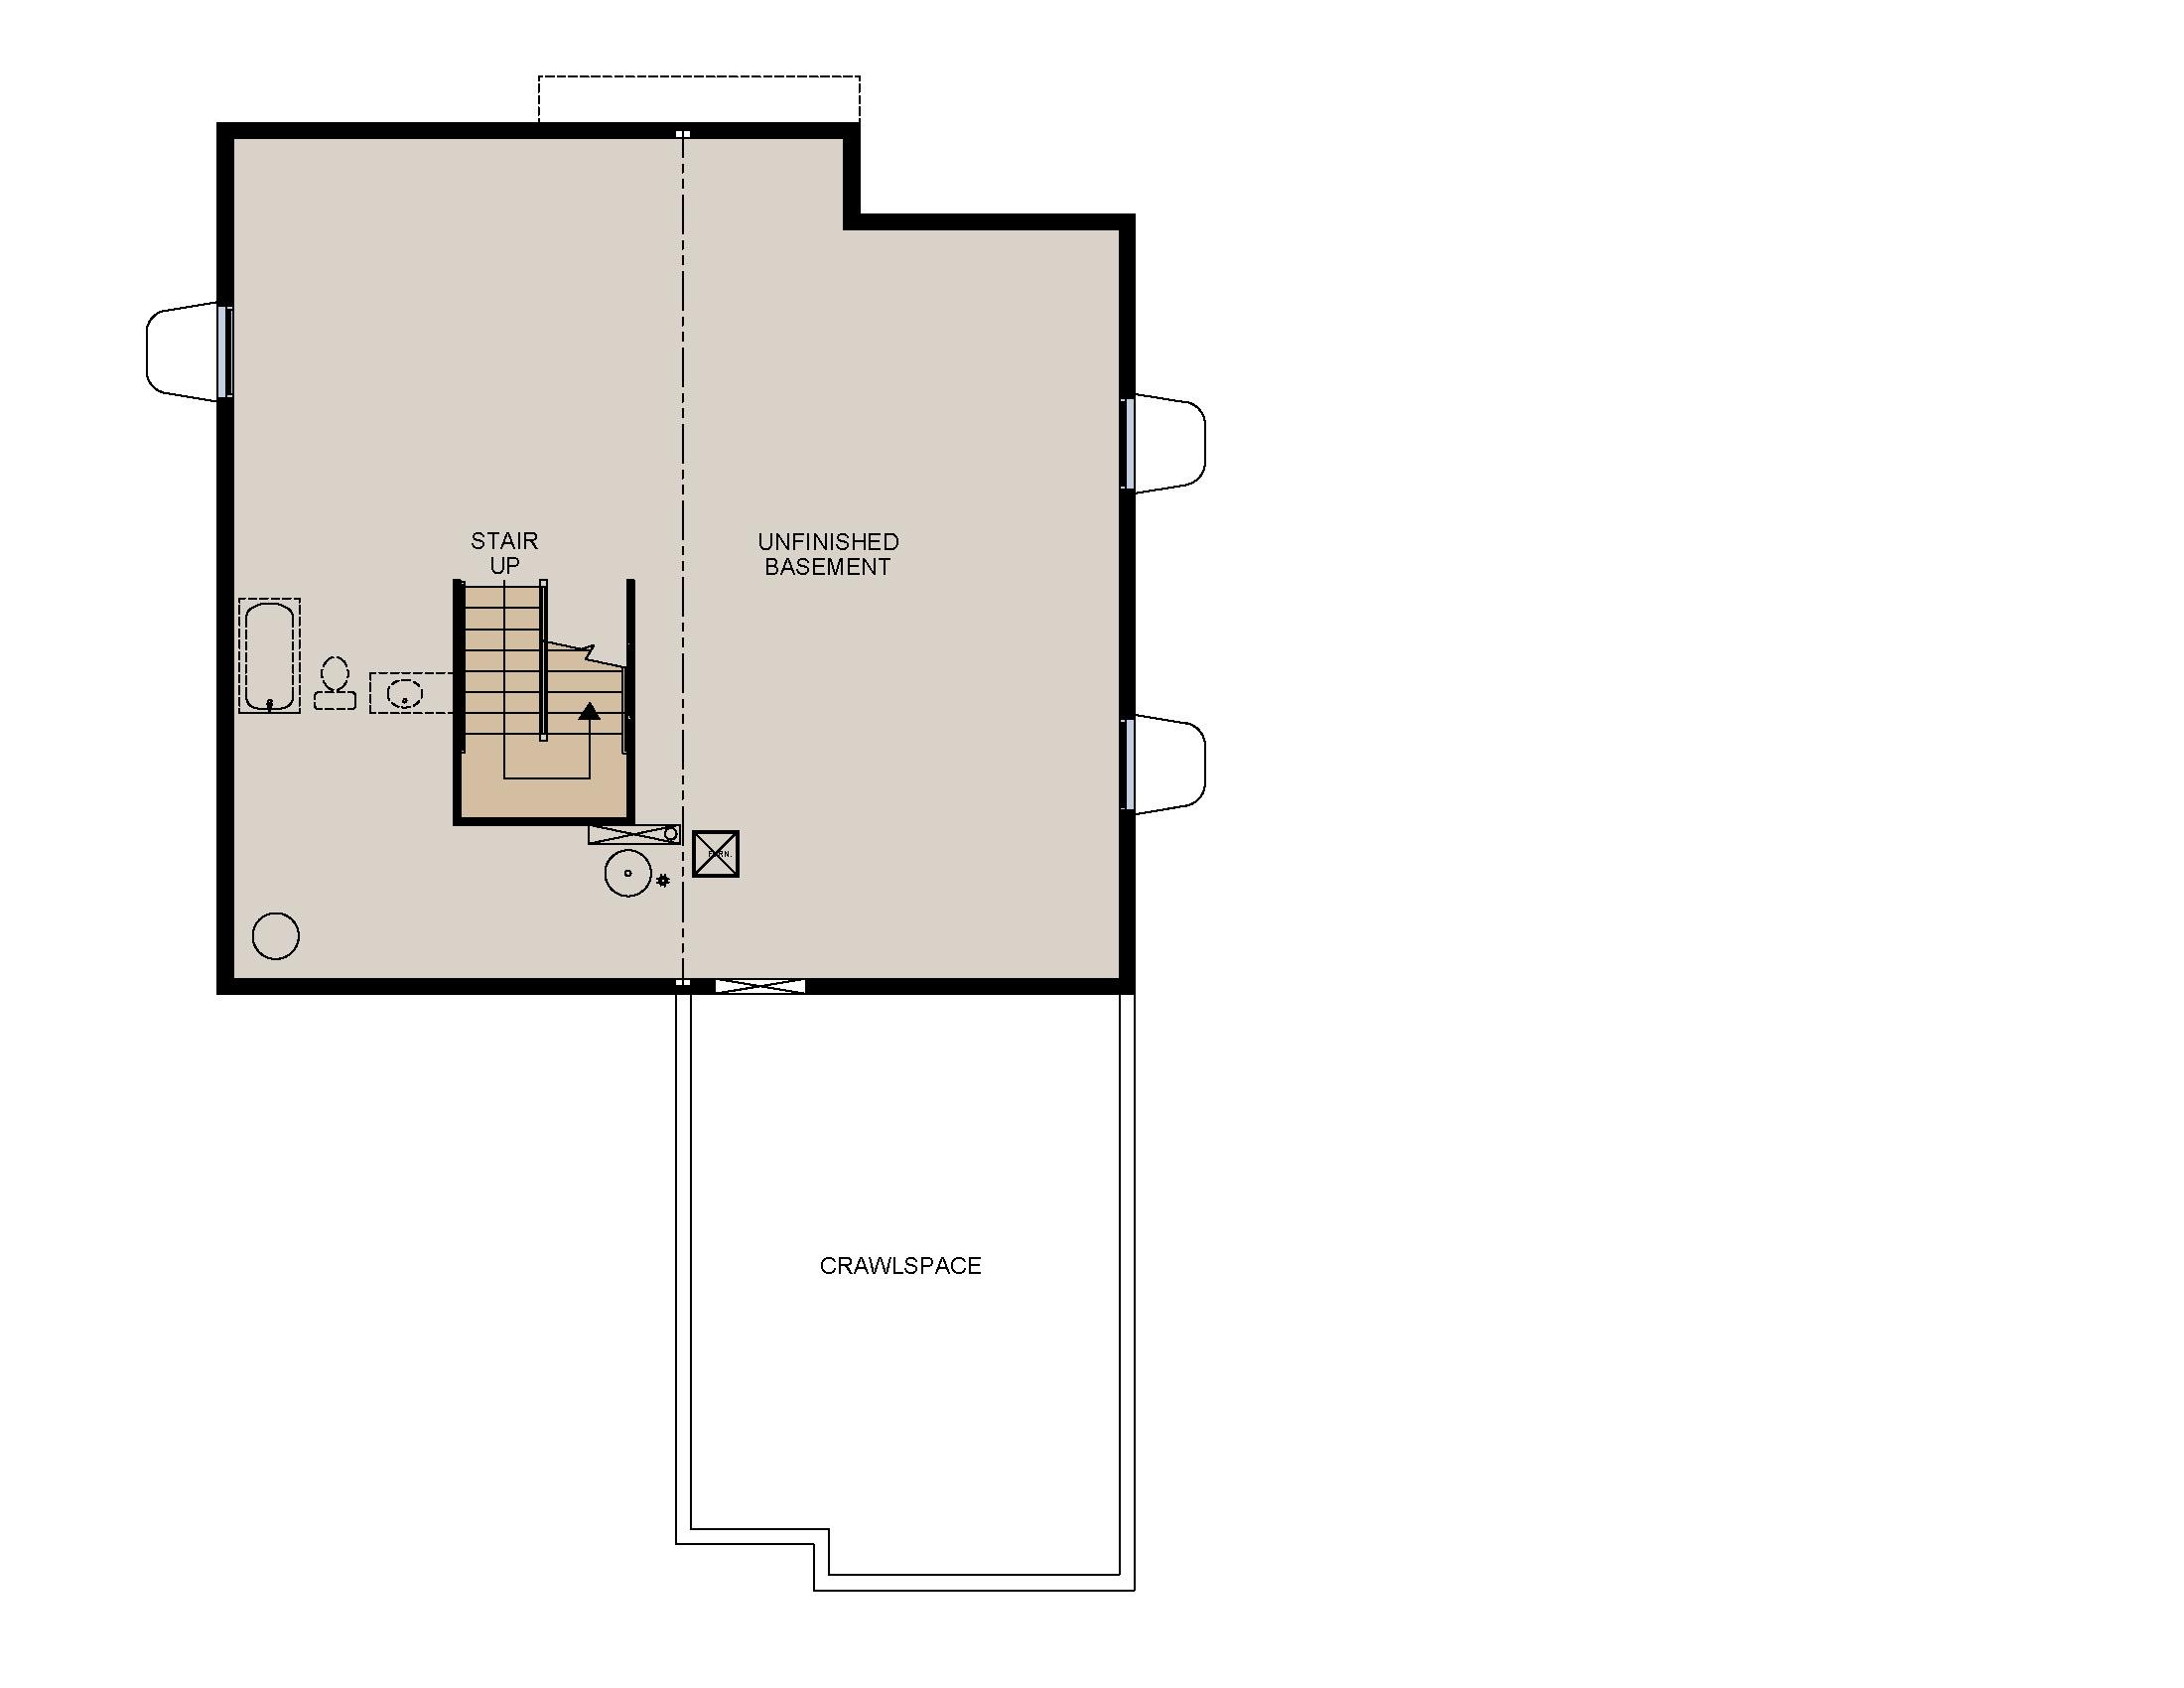 2013webster-basementplan.jpg